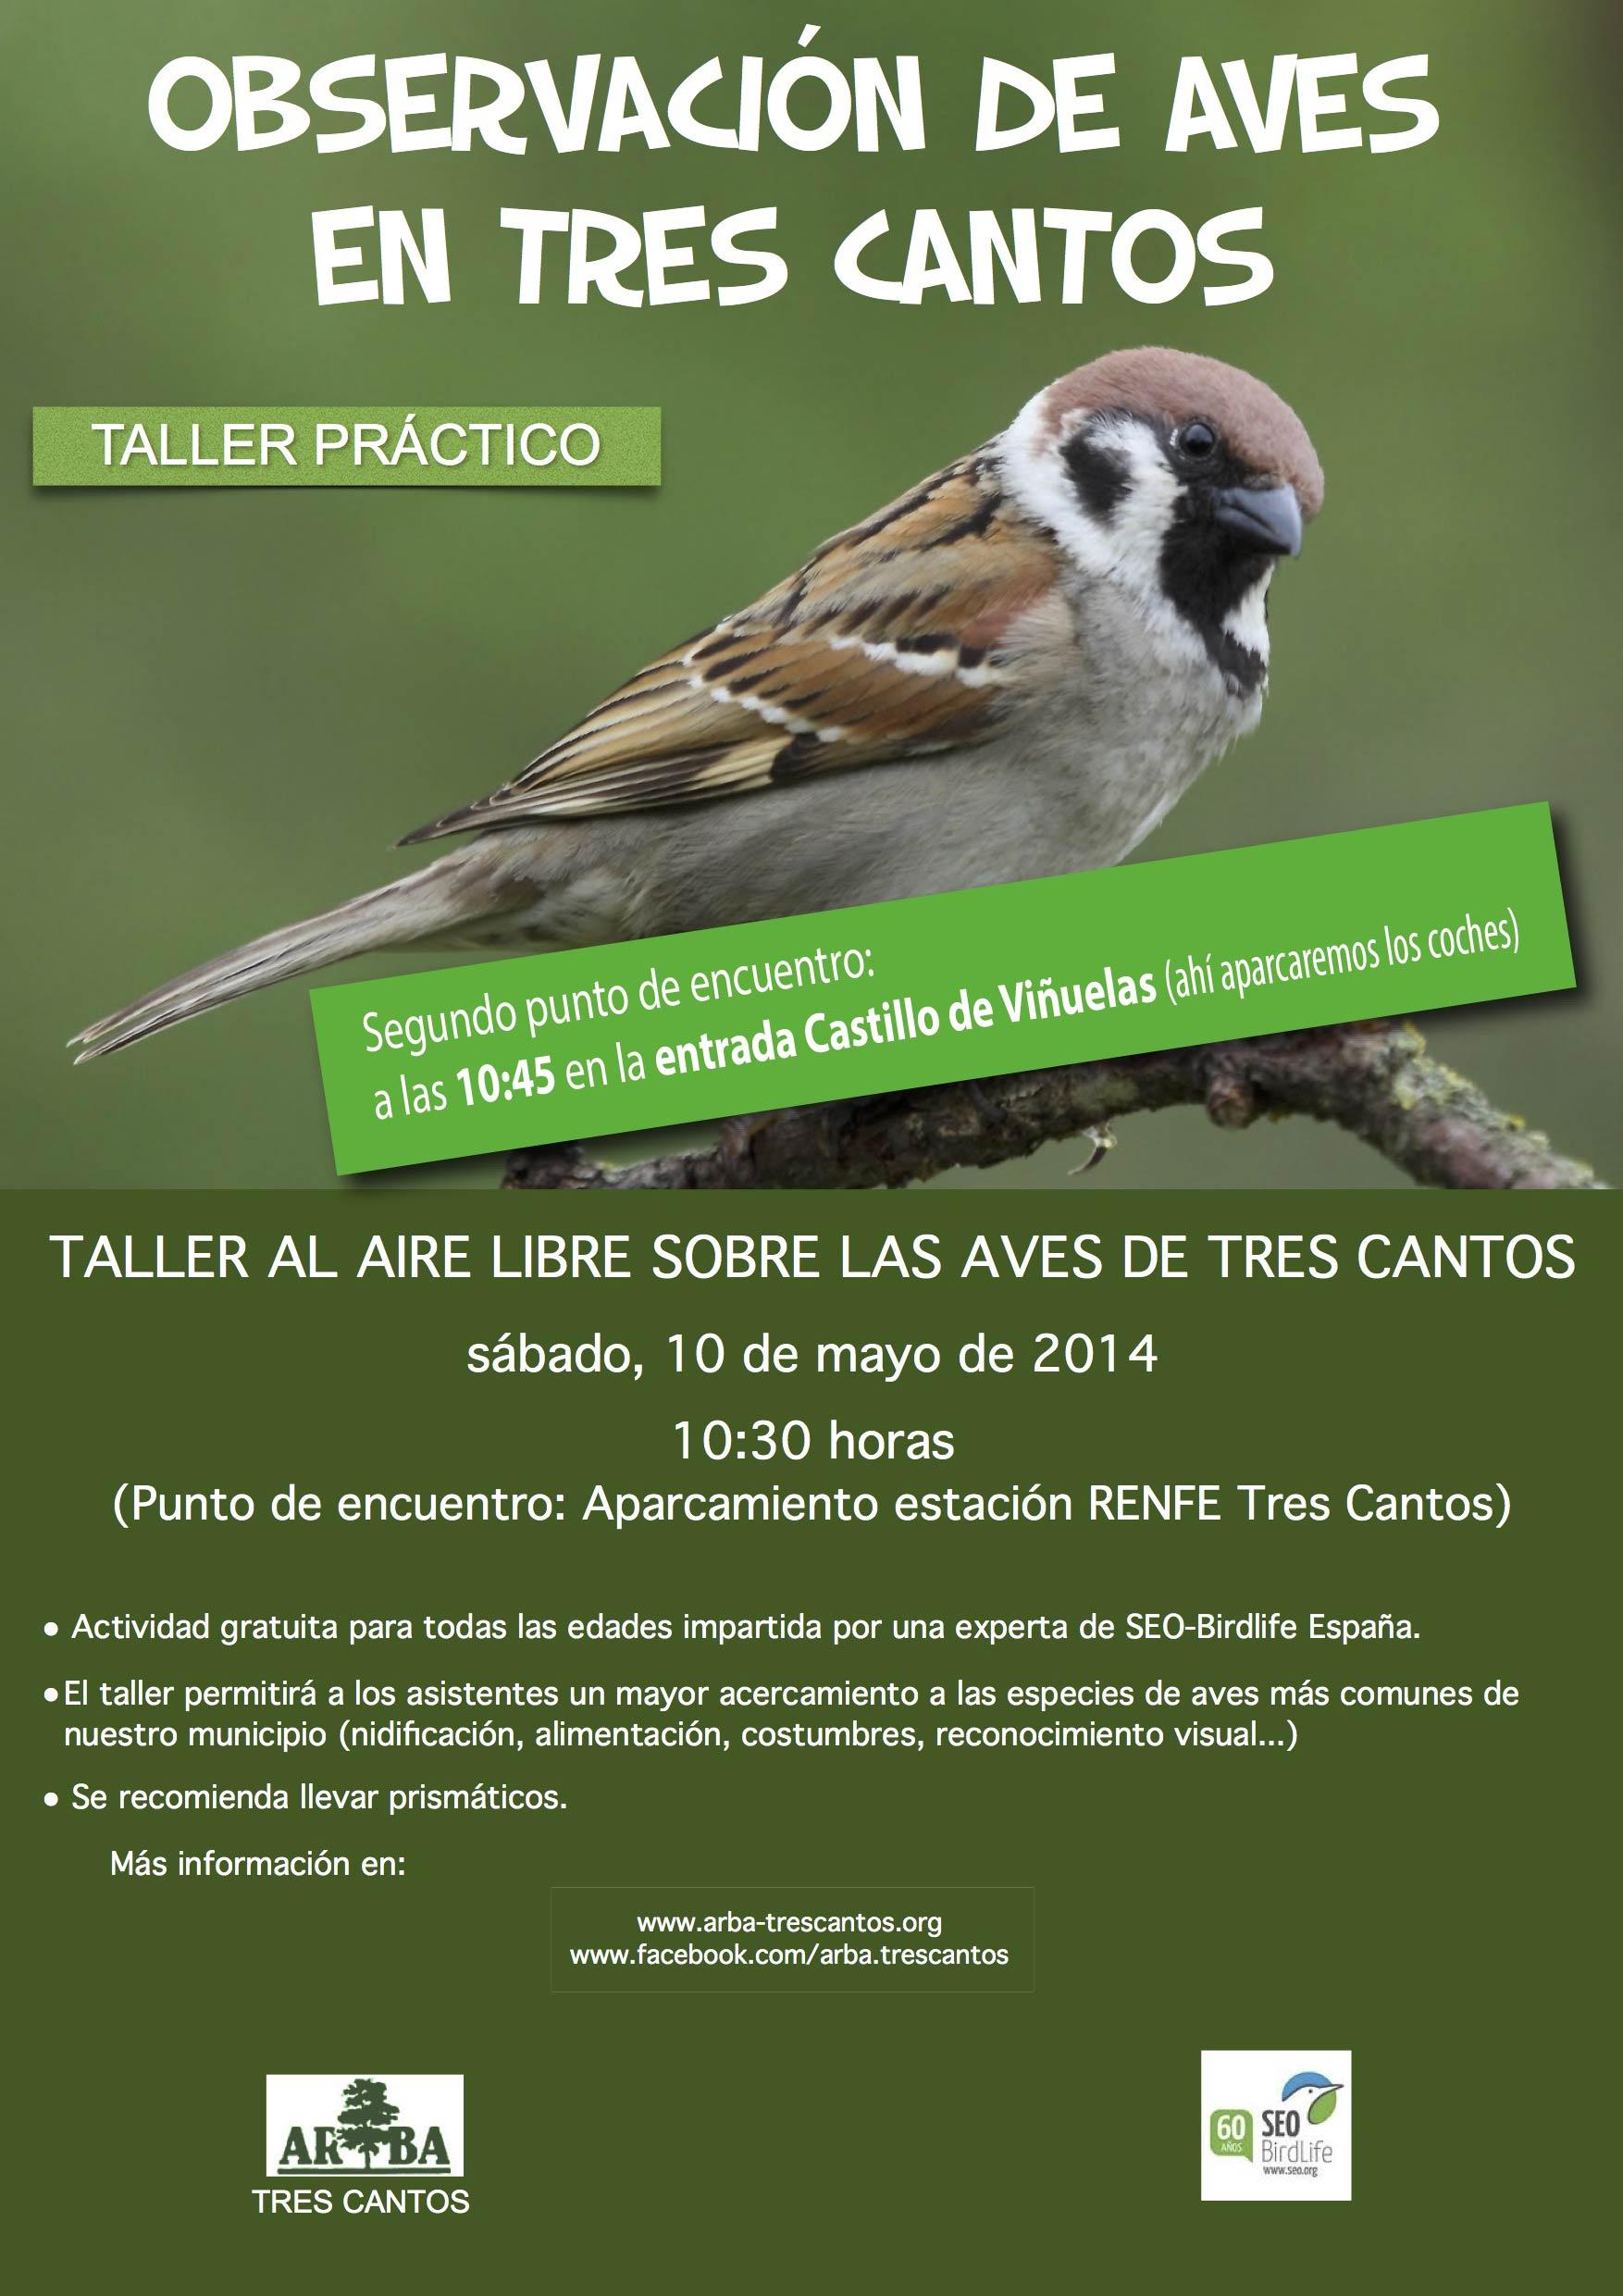 Taller al aire libre sobre las Aves de Tres Cantos – 10 mayo 2014